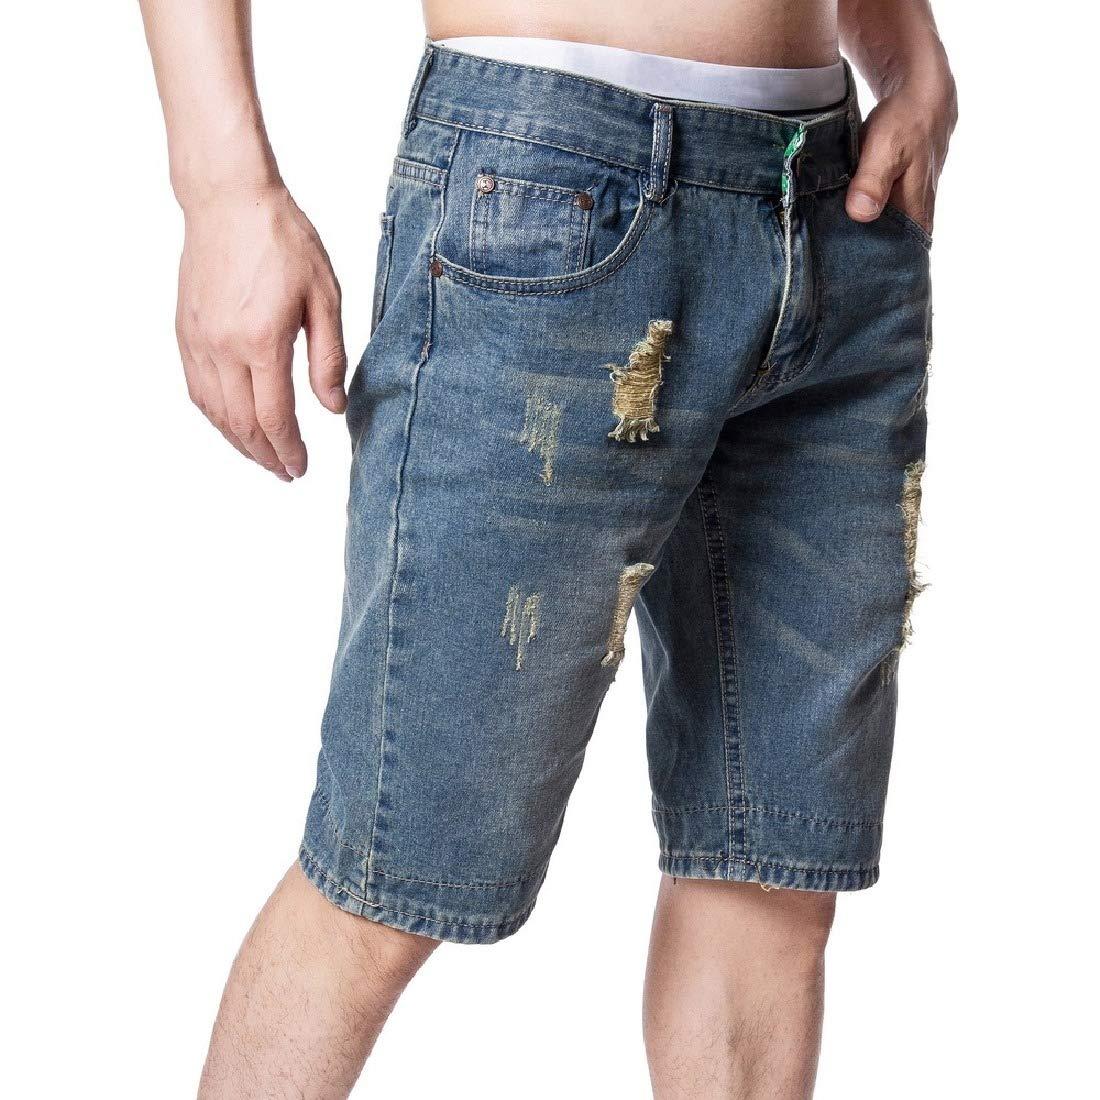 Winwinus Men Mid-Rise Trim-Fit Faded Ripped Distressed Casual Denim Shorts